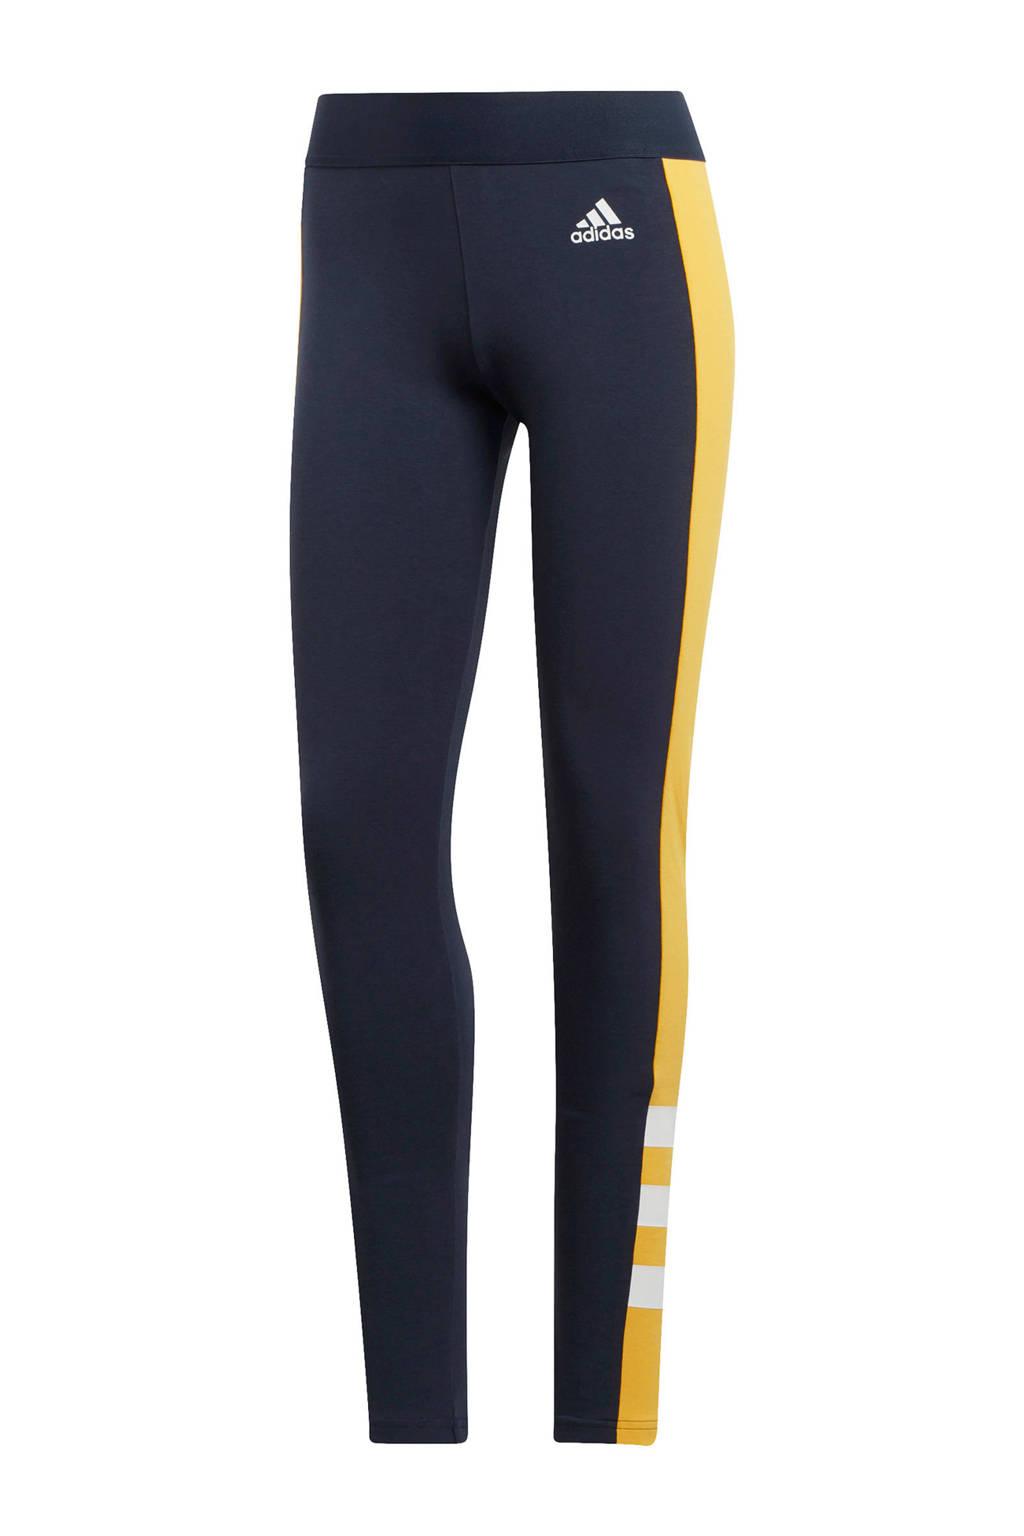 adidas performance sportbroek donkerblauw, Donkerblauw/geel